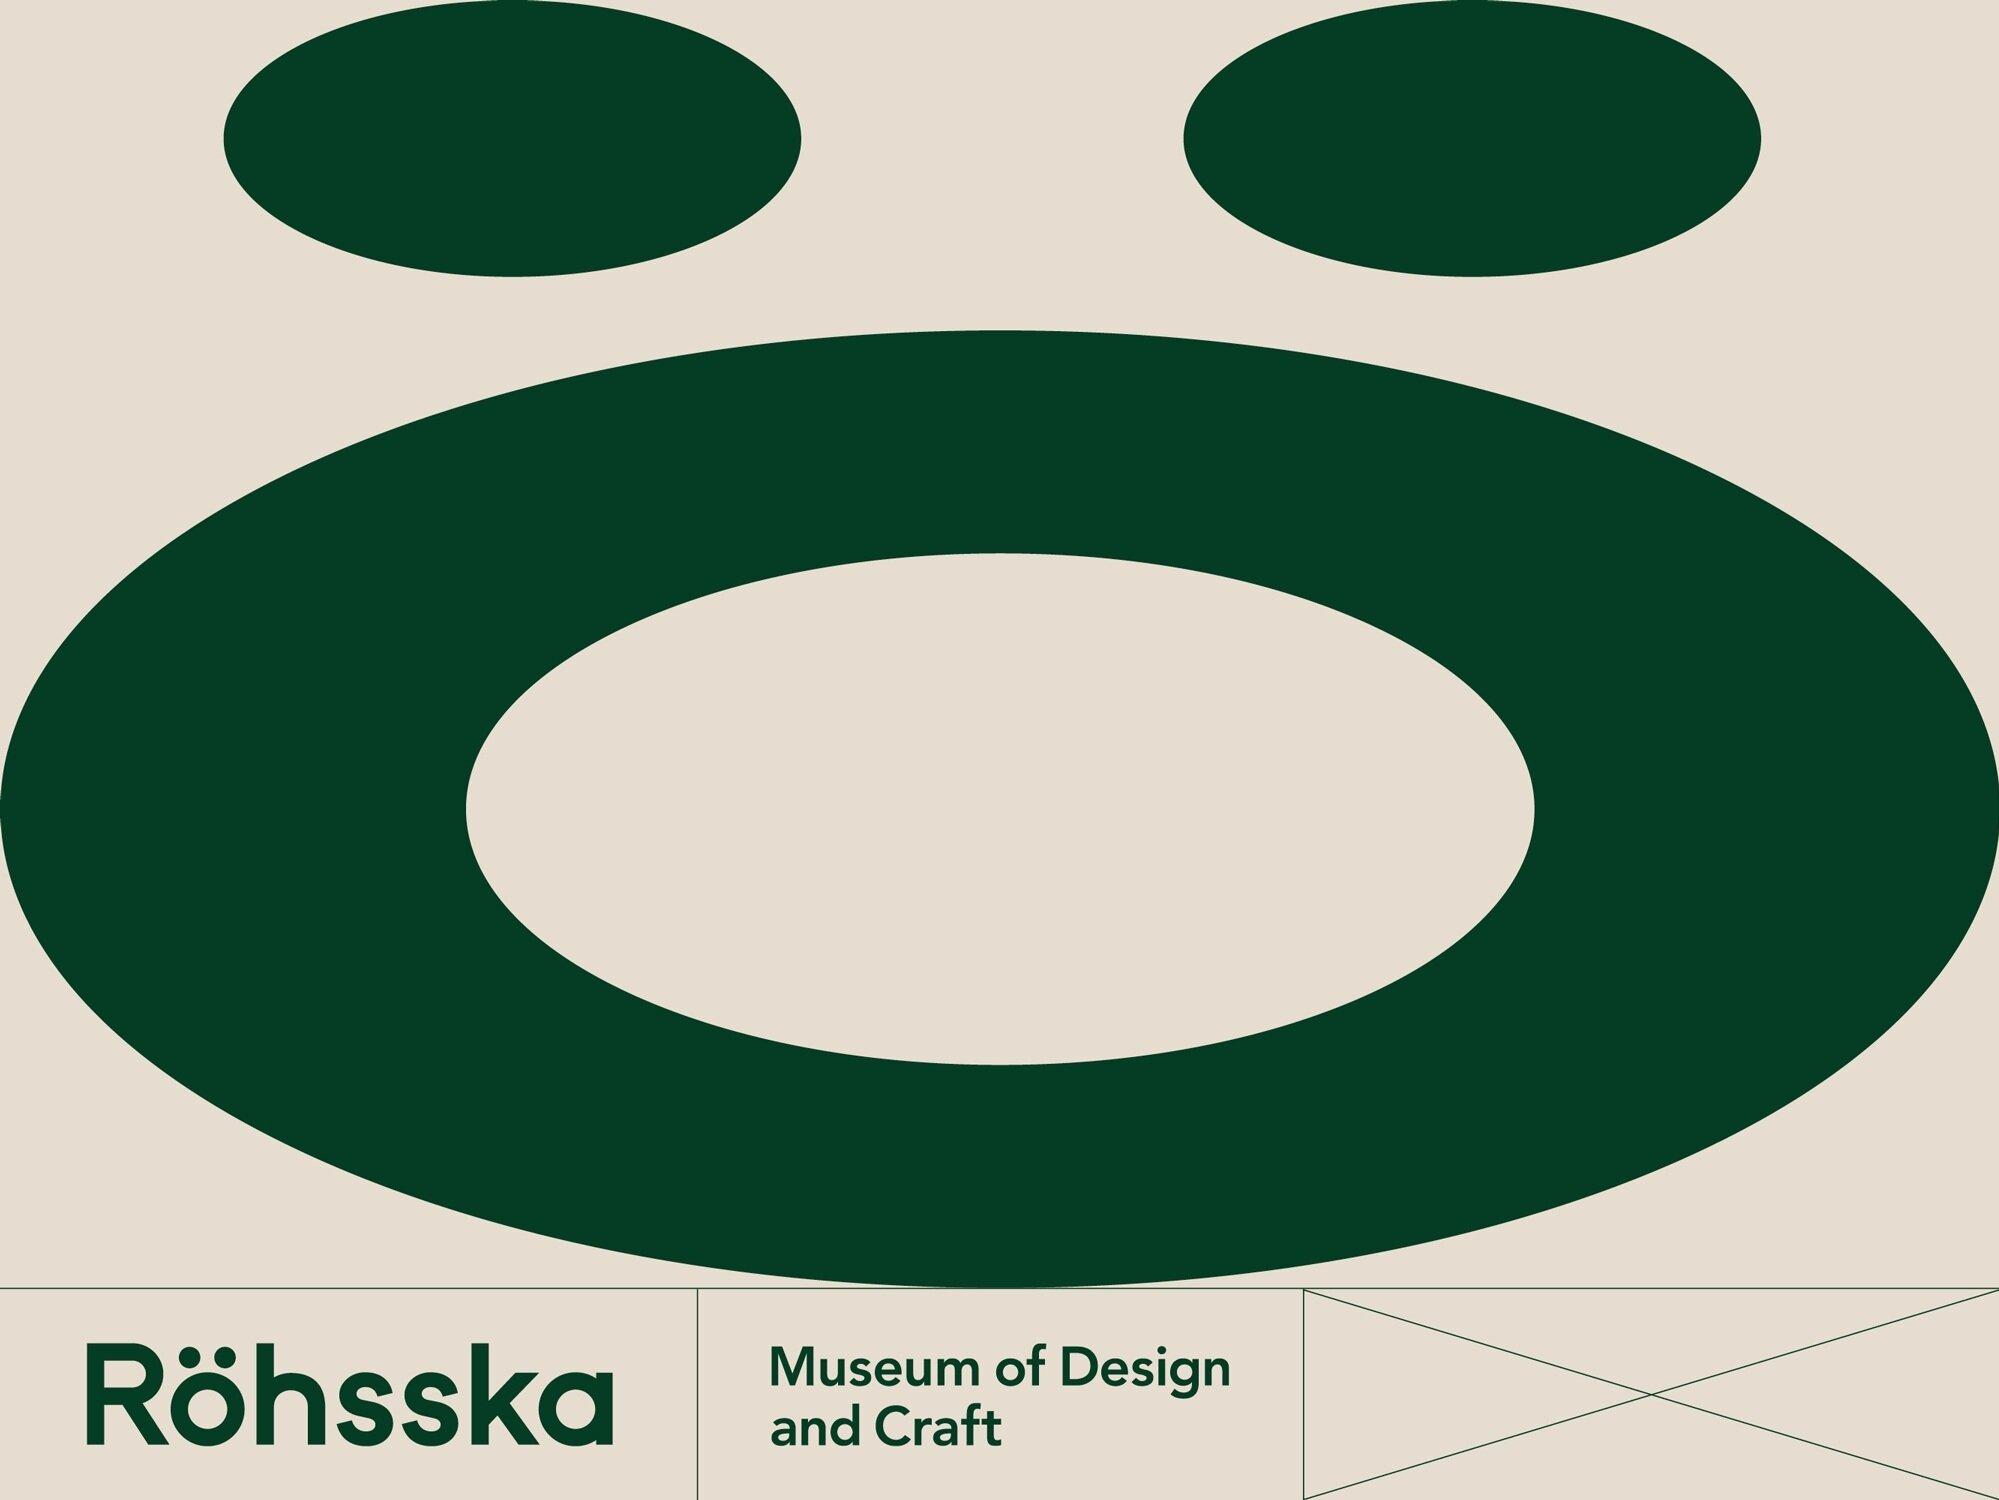 rohsska_museum_logo_icon_and_wordmark.jpg